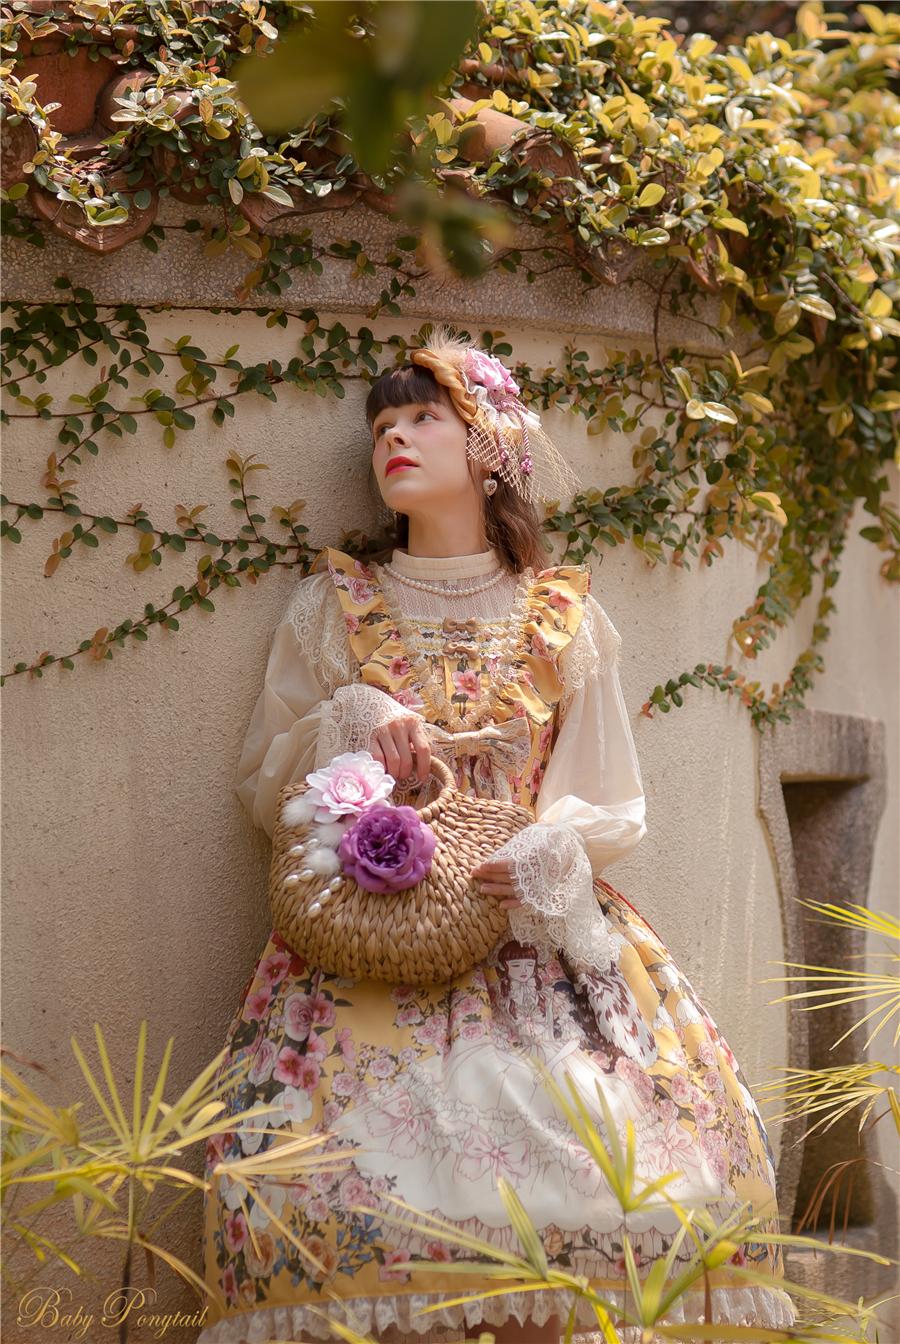 Baby Ponytail_Model Photo_Polly's Garden of Dreams_JSK Yellow_Claudia_14.jpg